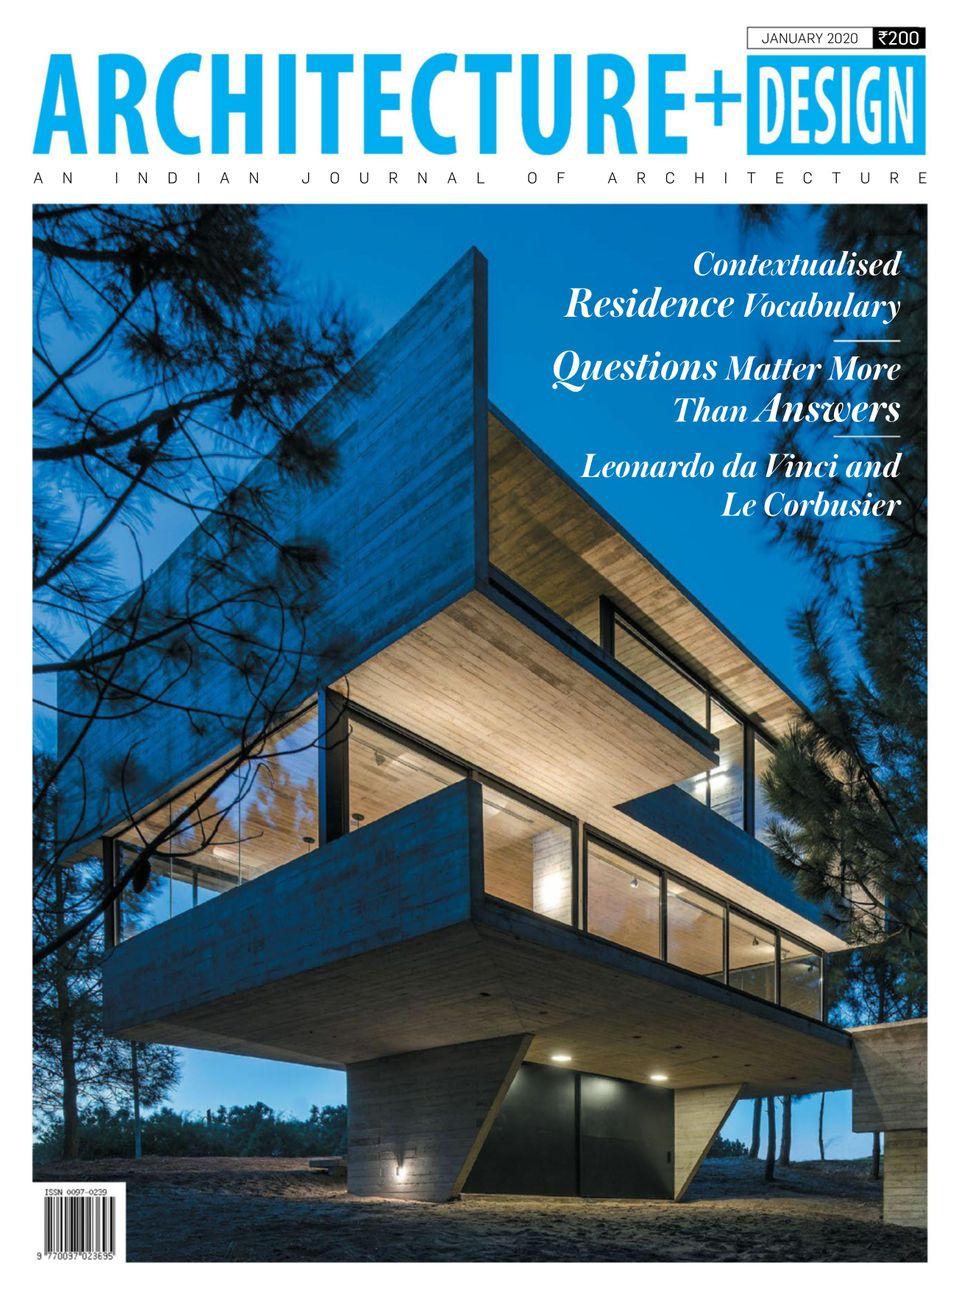 Architecture Design January 2020 Magazine Get Your Digital Subscription